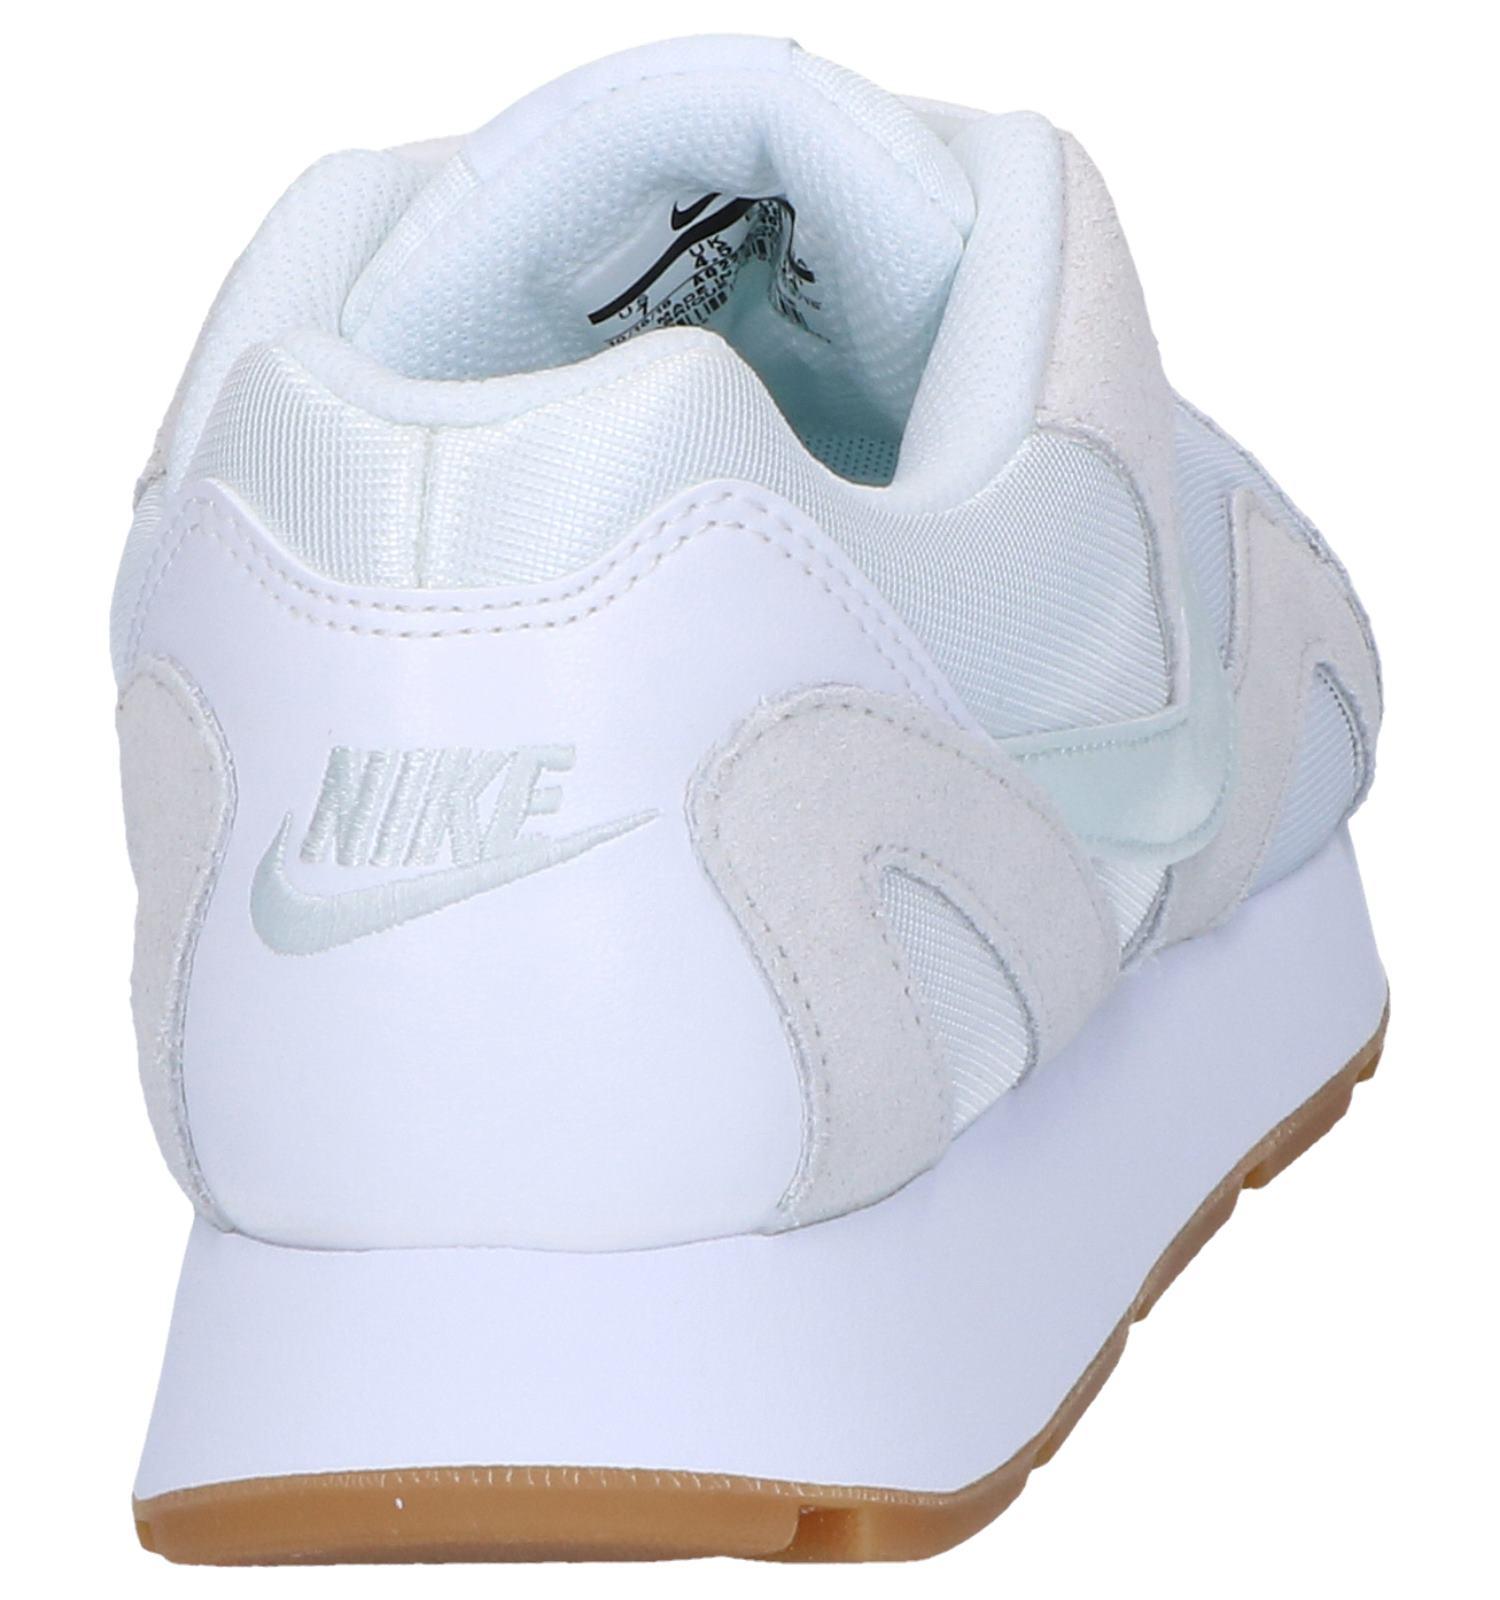 quality design 9afdb 5c3f2 Witte Sneakers Nike Delfine   TORFS.BE   Gratis verzend en retour